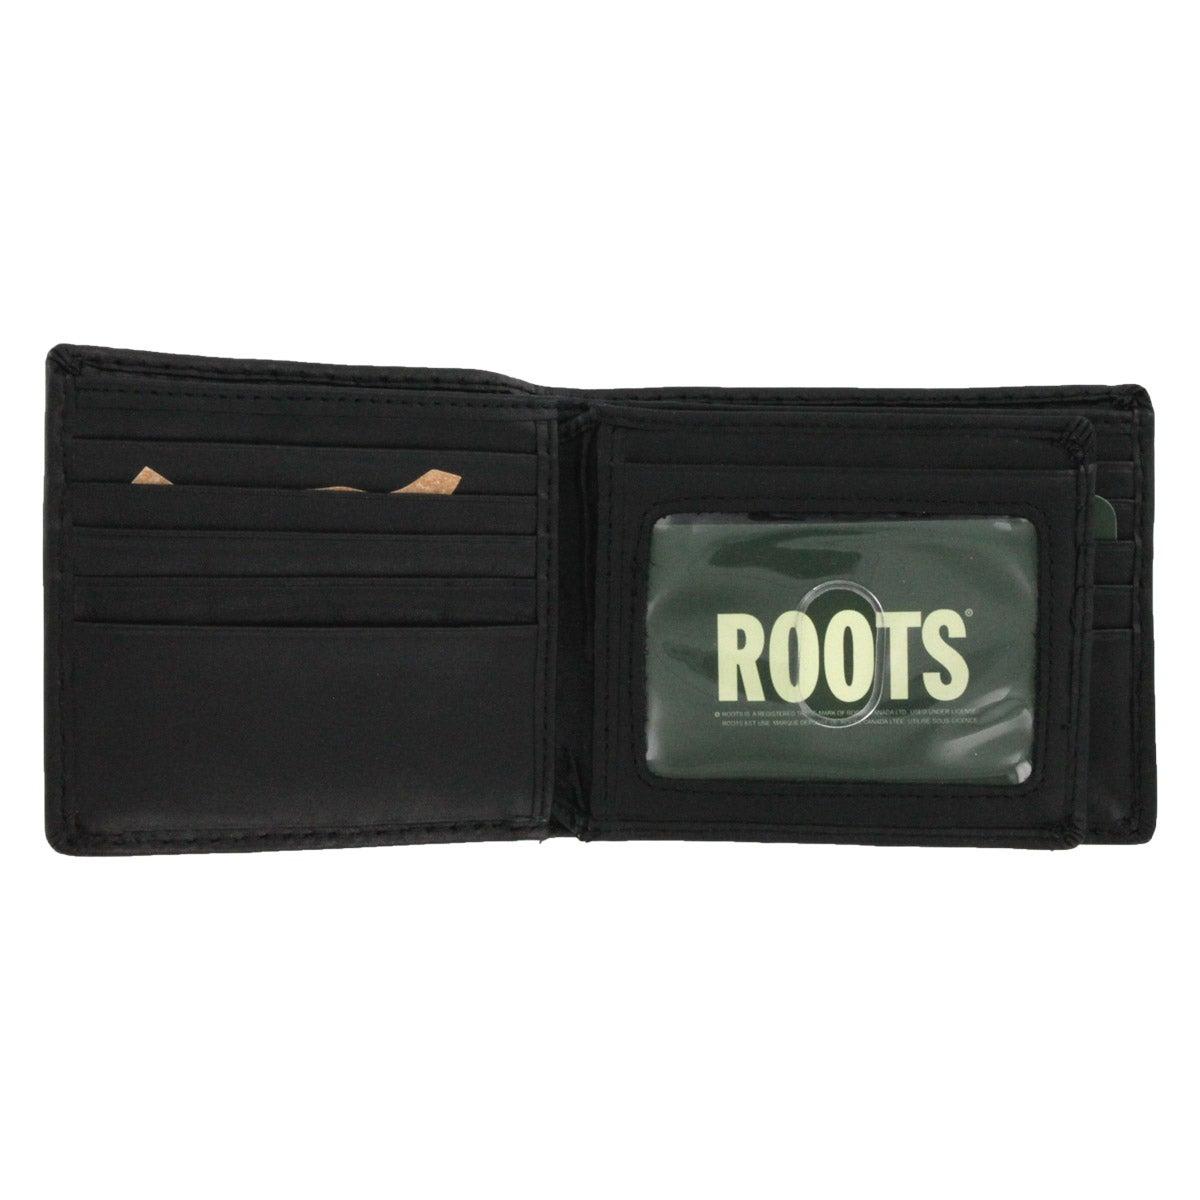 Mns Roots73 R552-4 blk slim-fold wallet